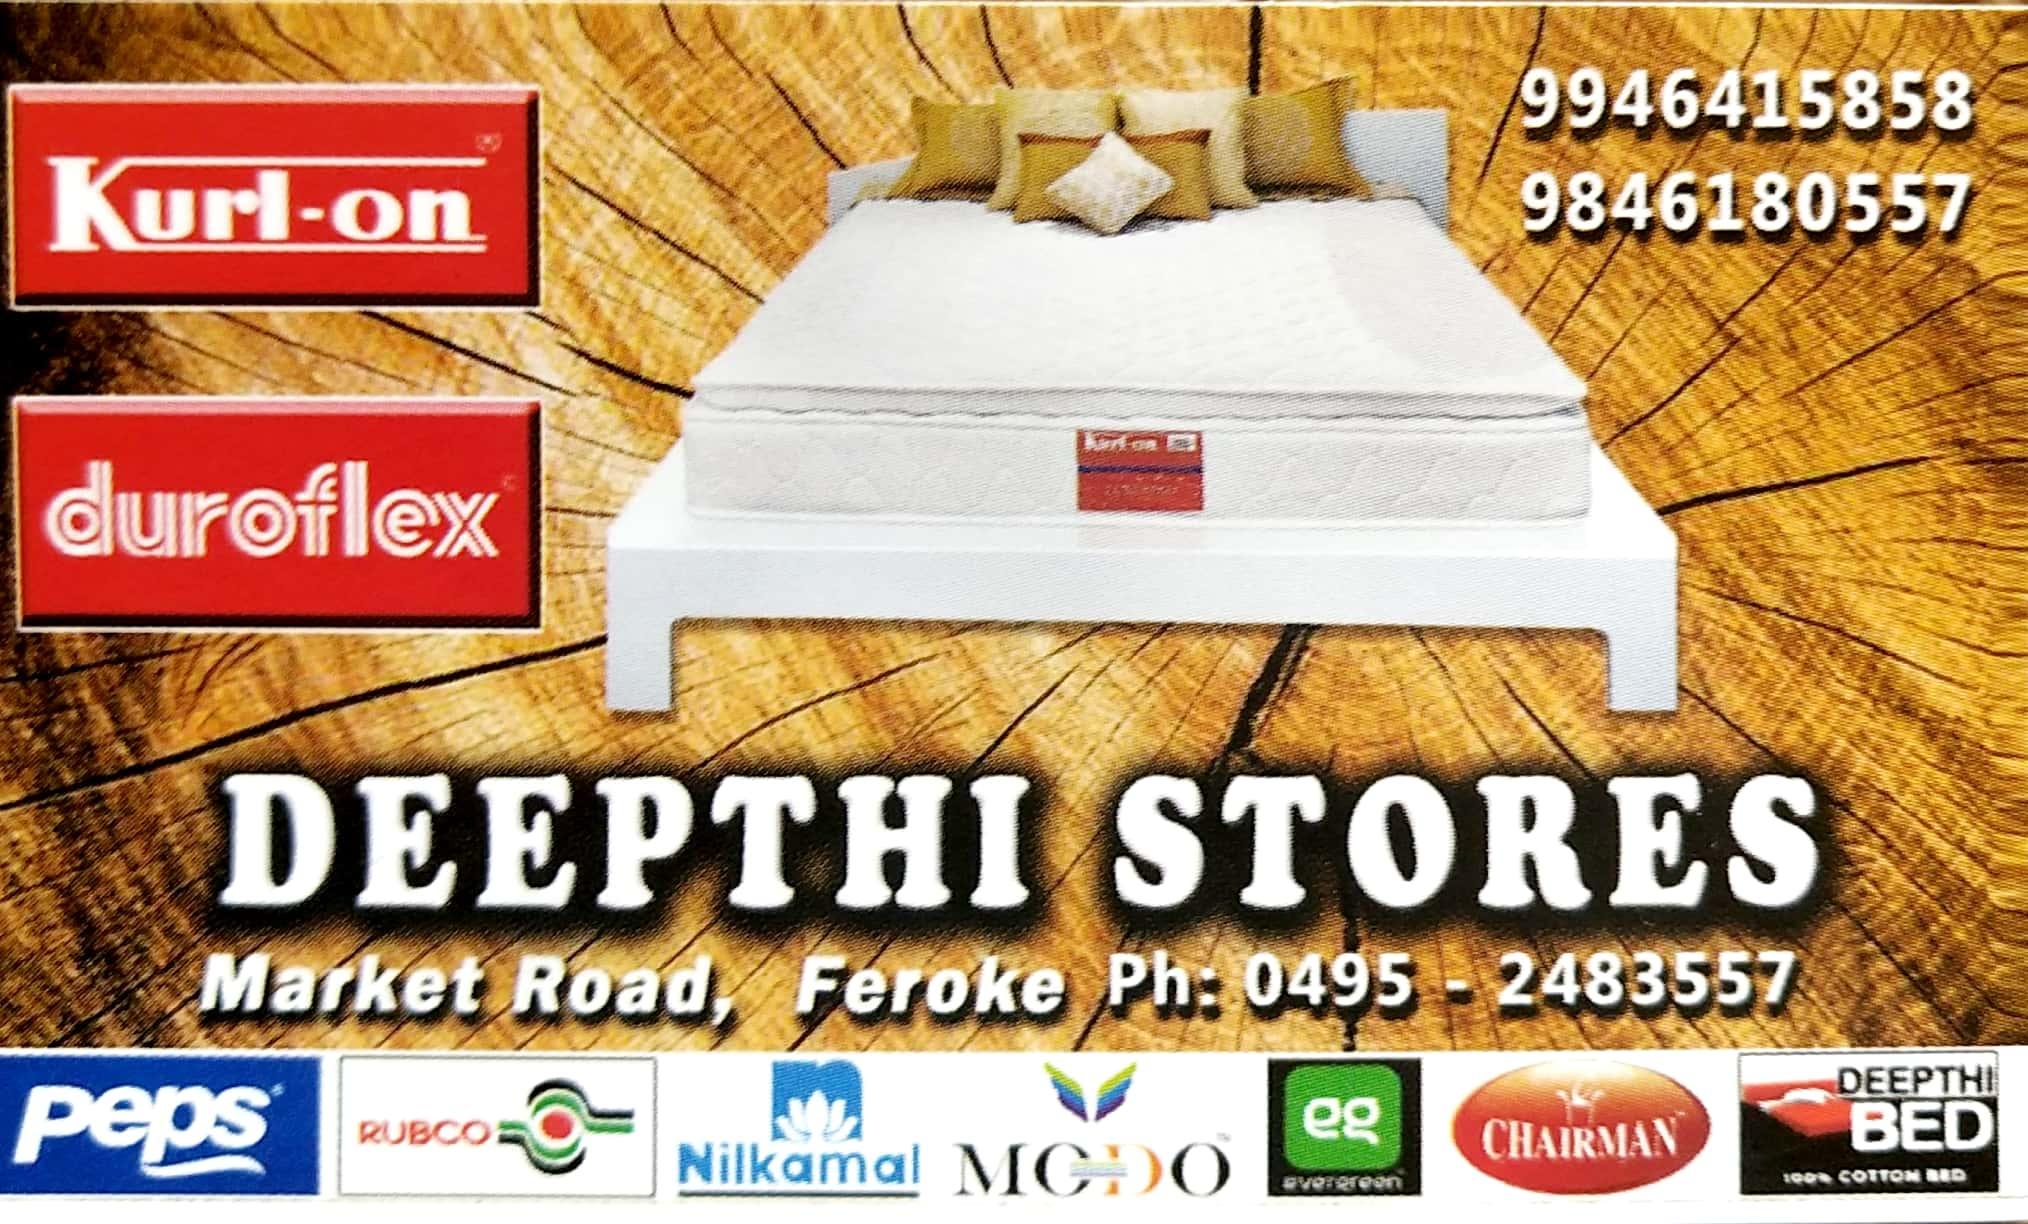 DEEPTHI STORES, MATTRESSES,  service in Farook, Kozhikode